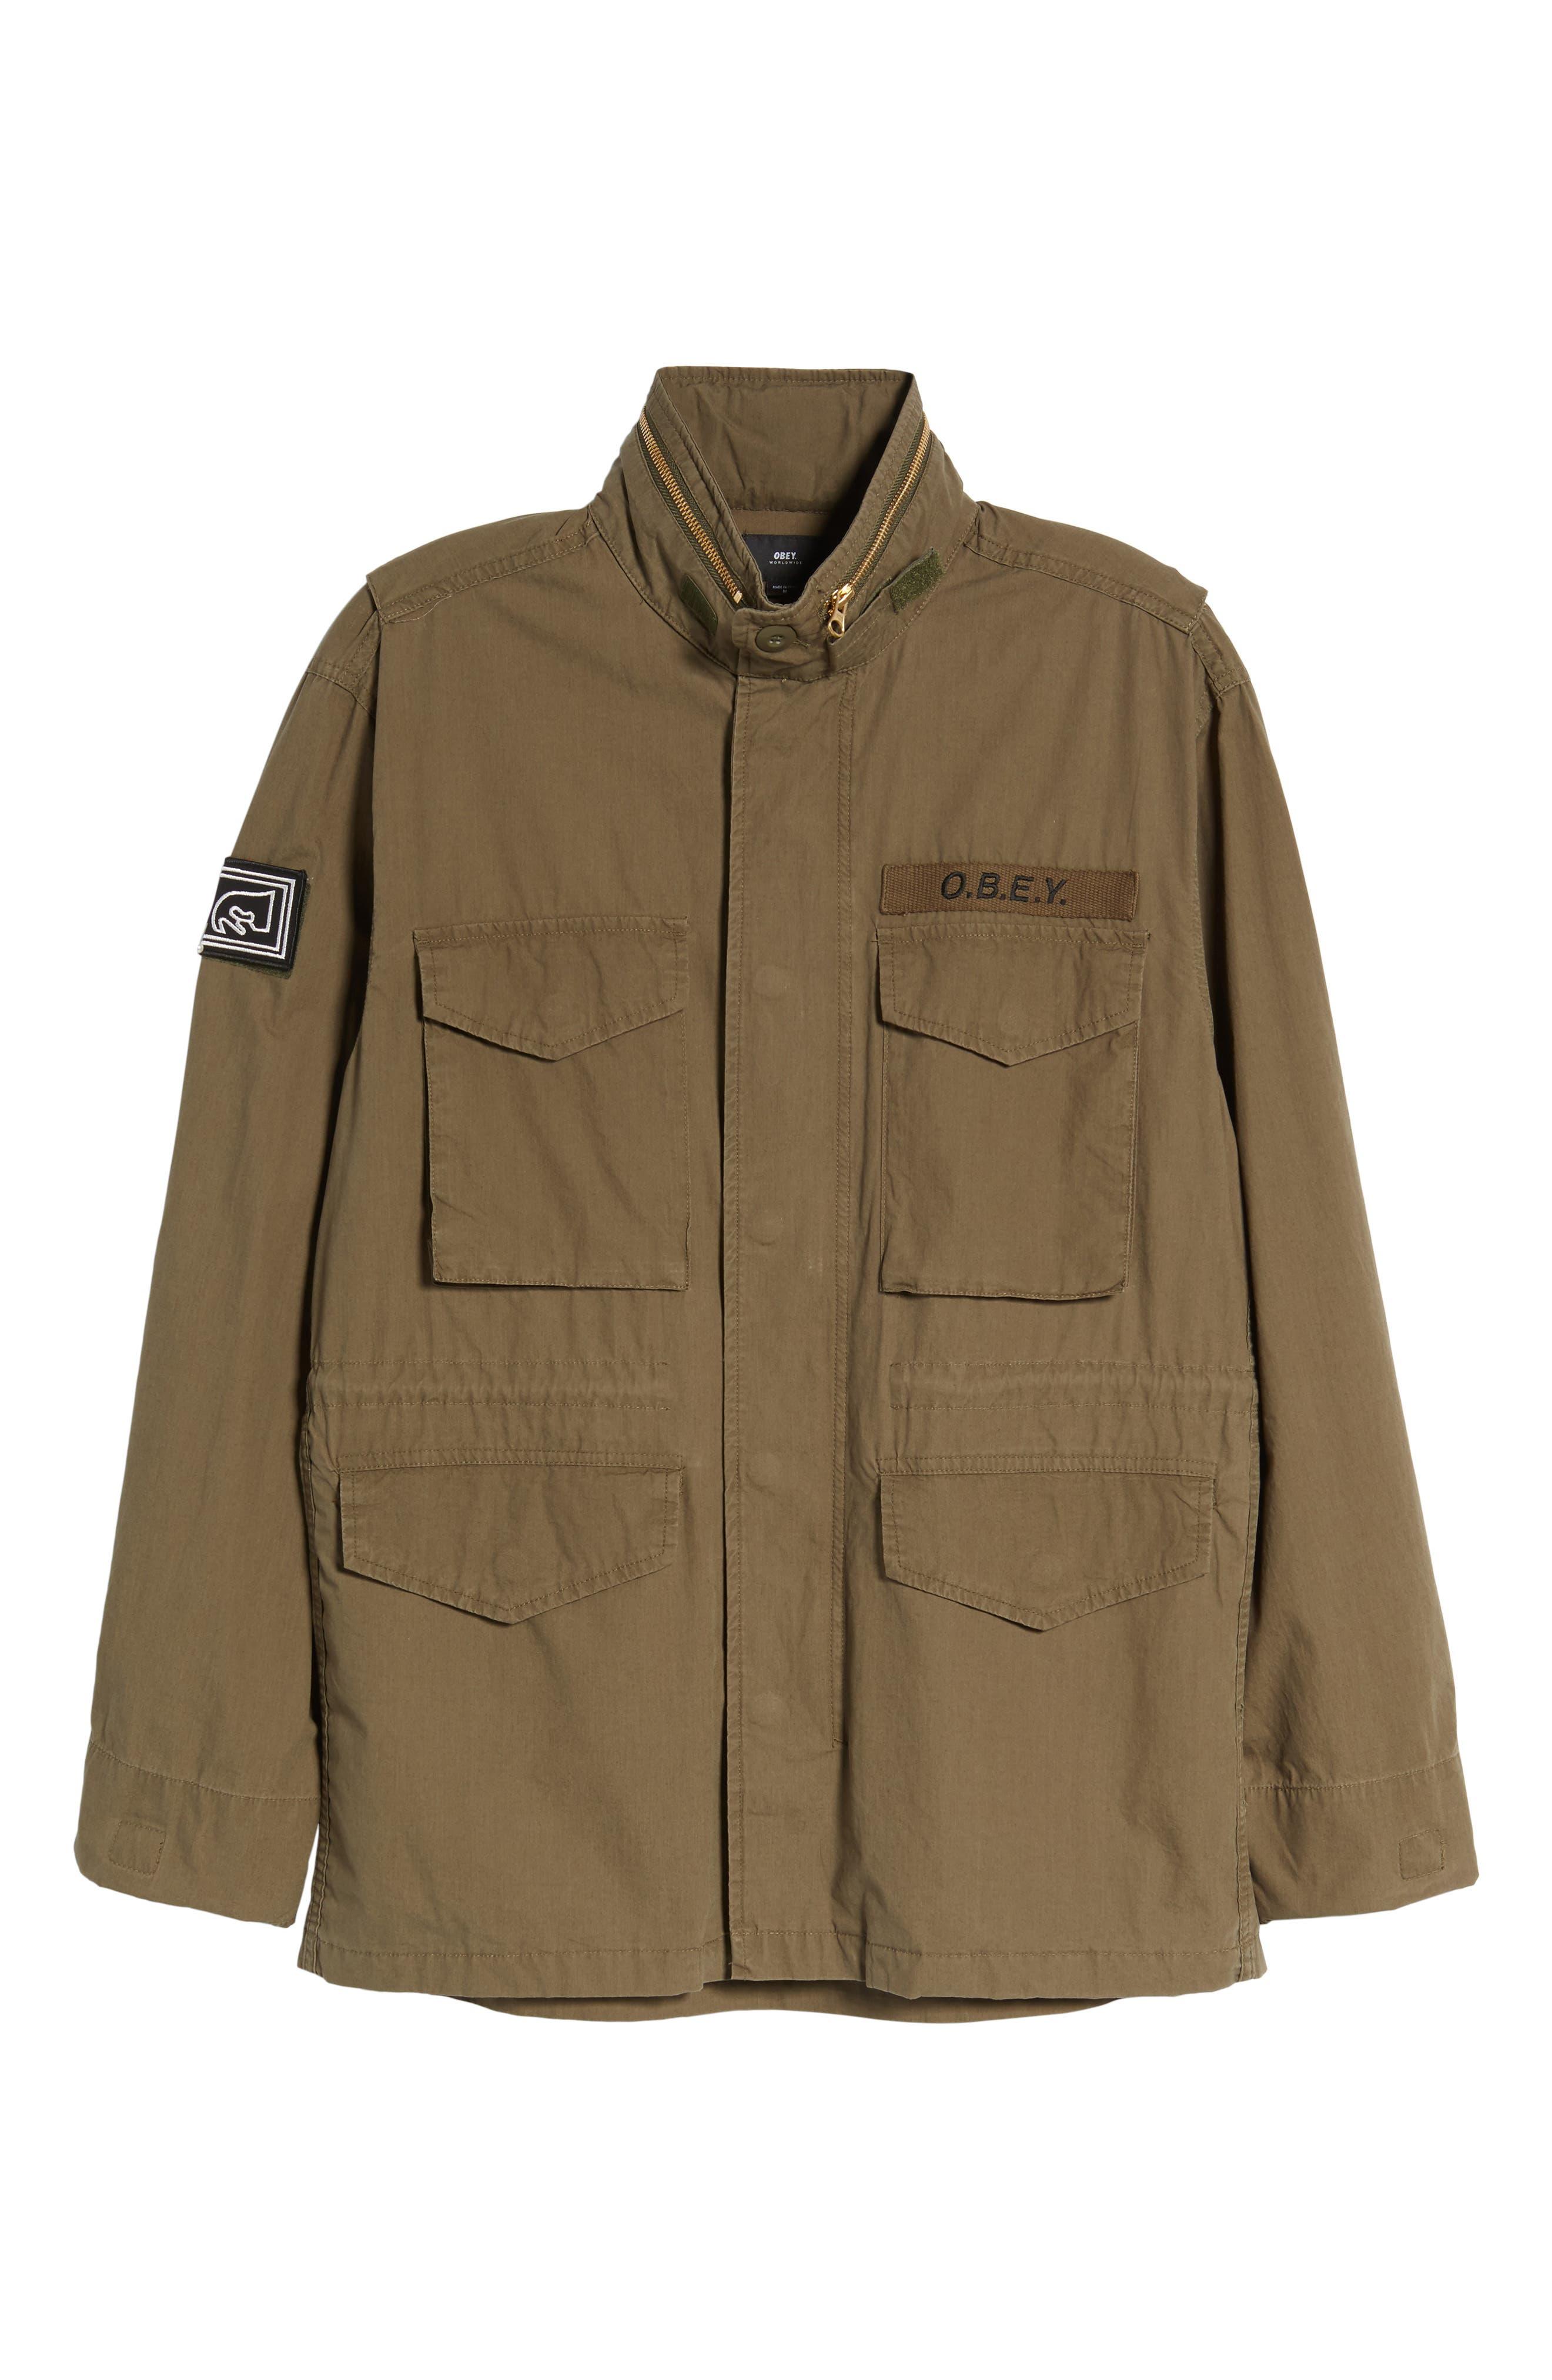 Iggy M65 Jacket,                             Alternate thumbnail 5, color,                             304